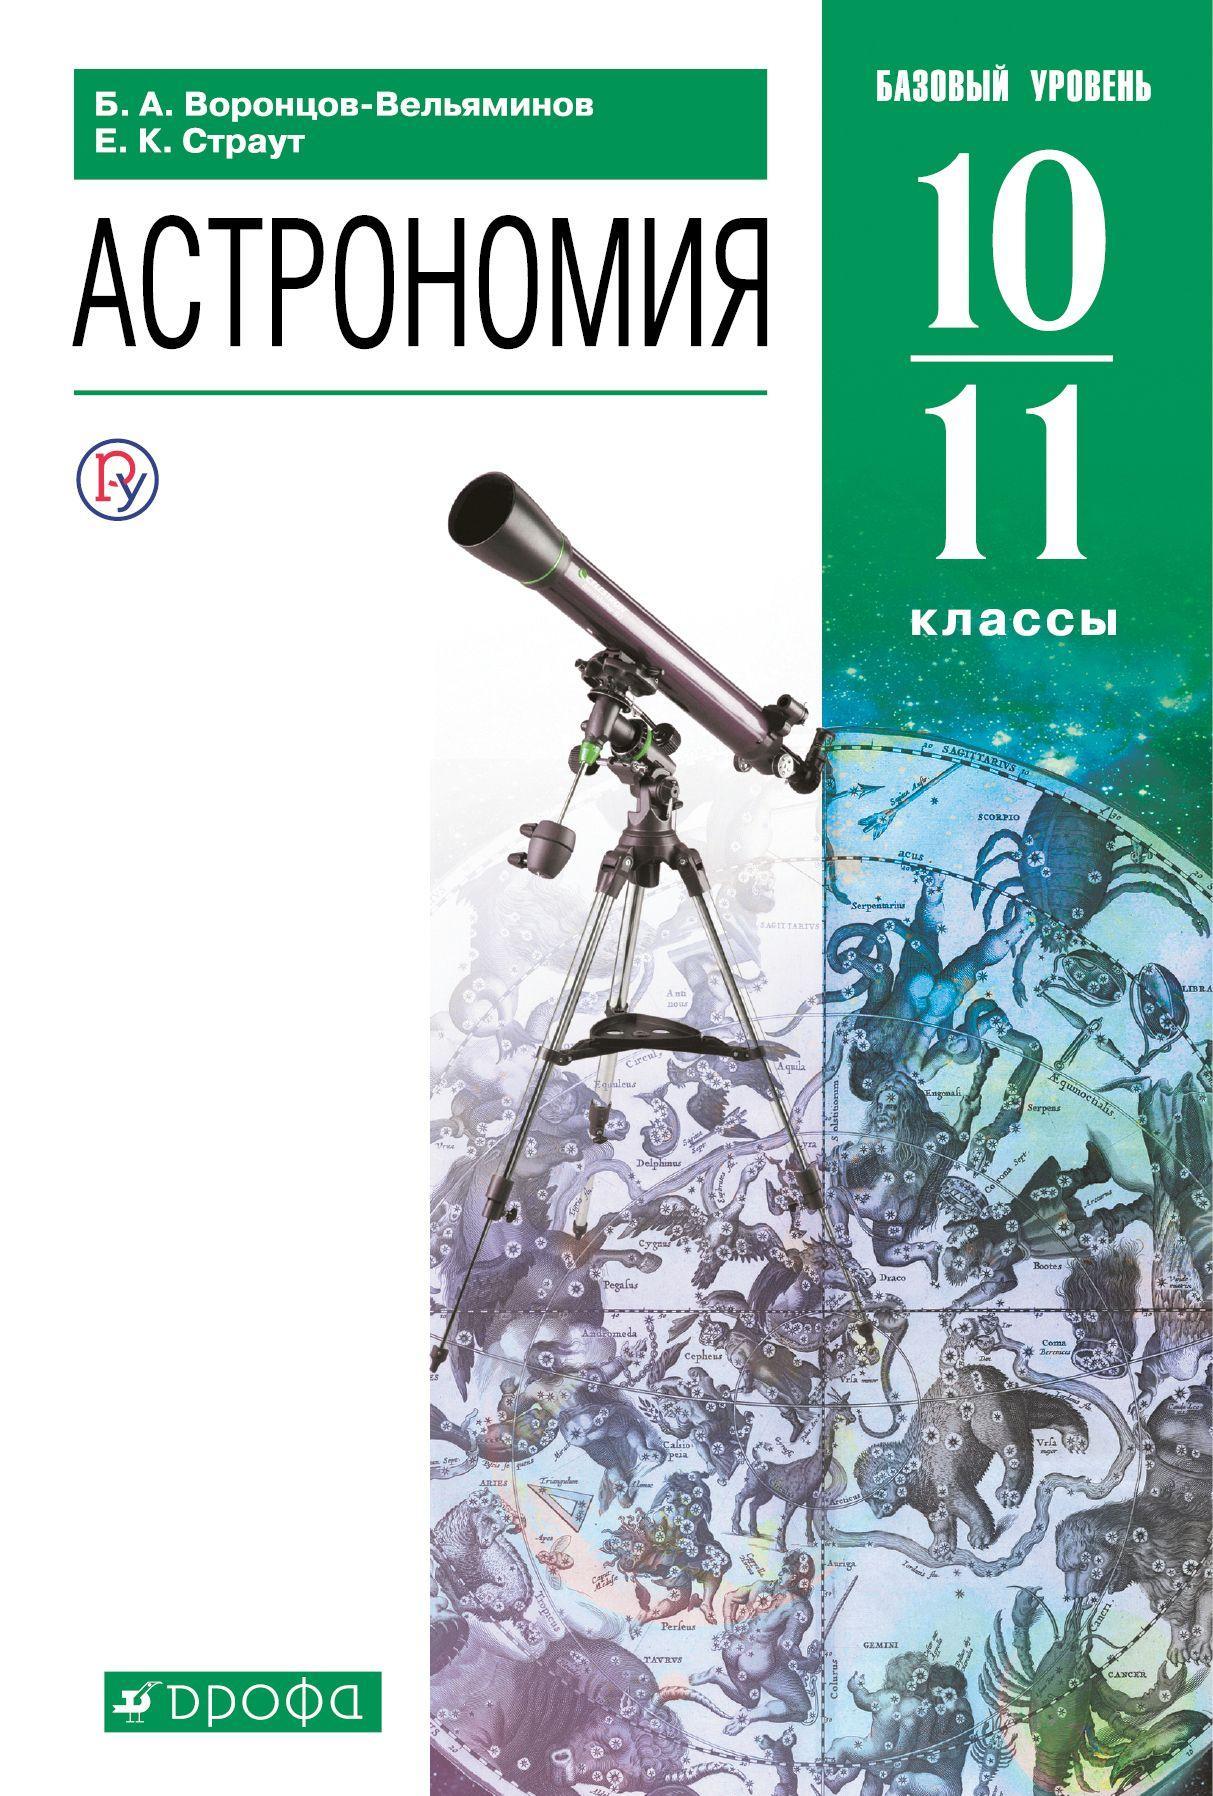 Astronomija. 10-11 klassy. Bazovyj uroven. Uchebnik.